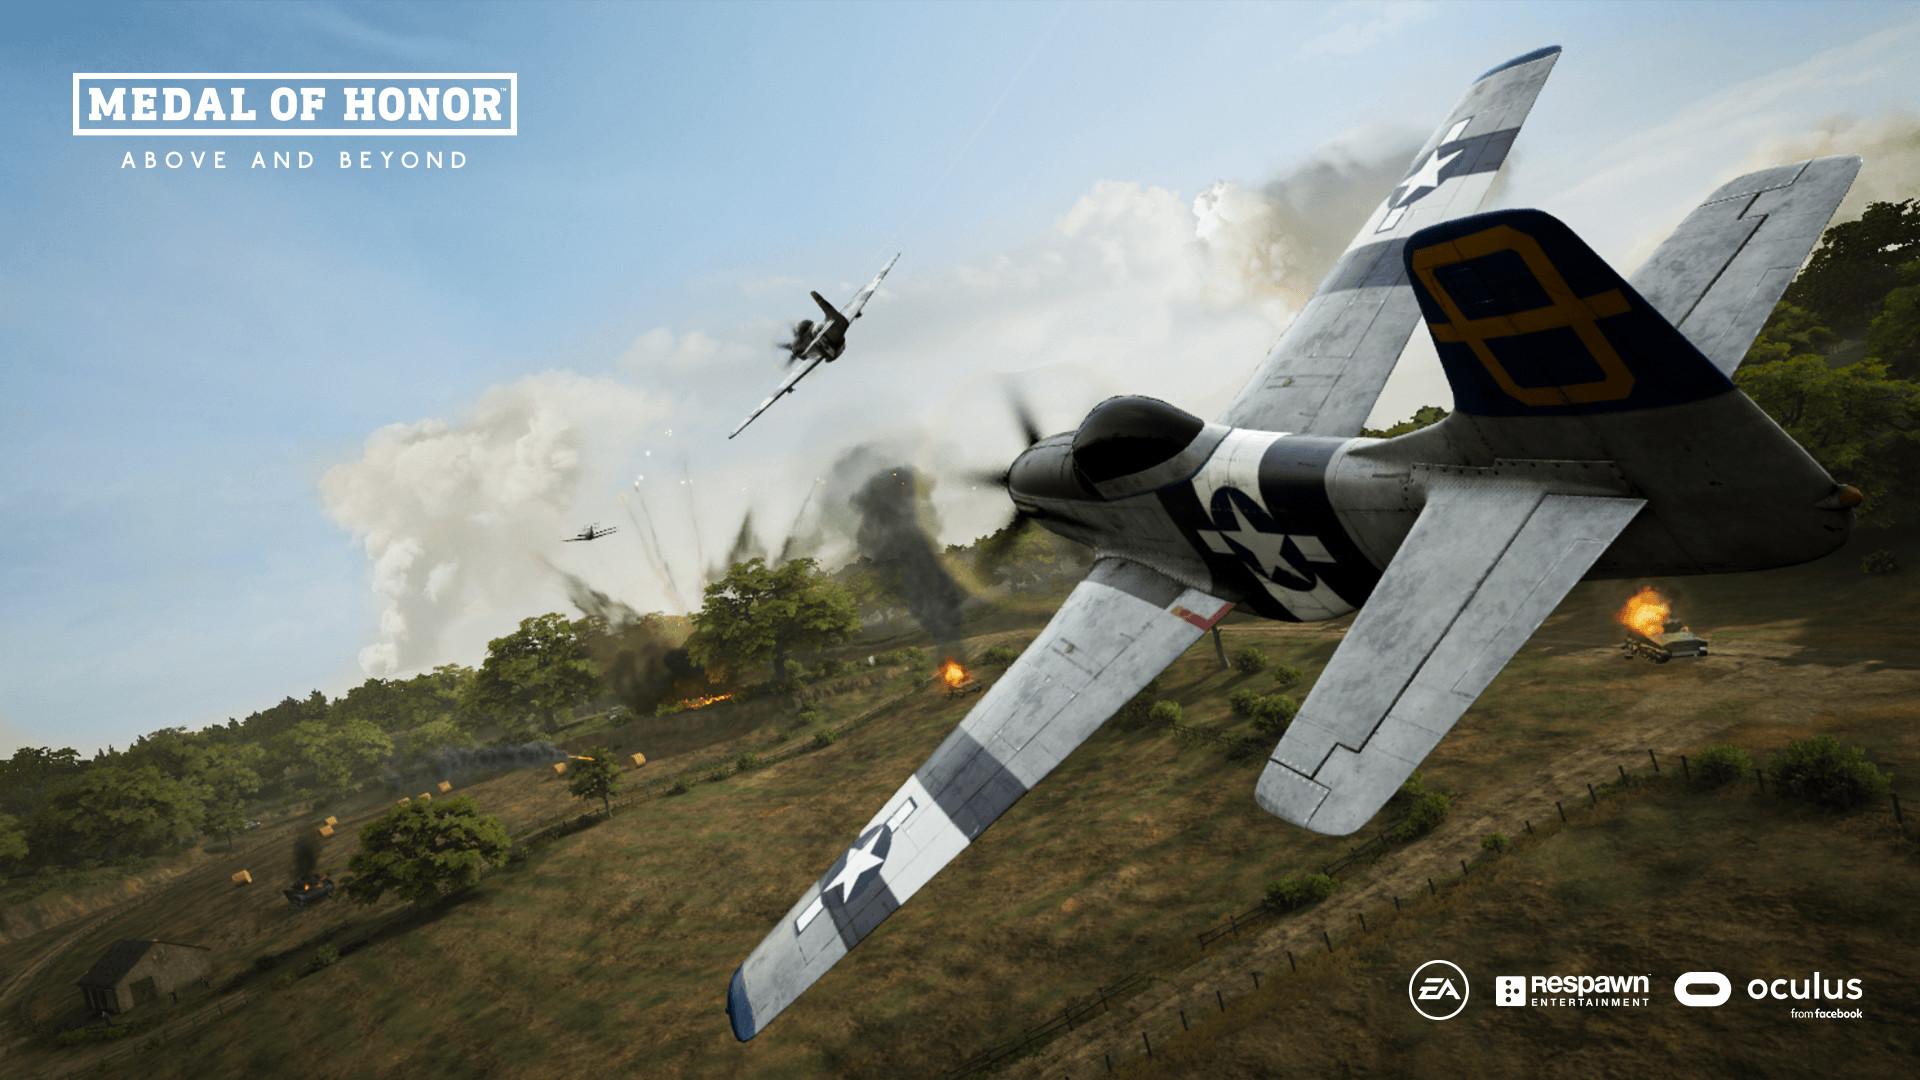 Medal of Honor: Above and Beyond - VR-Spiel erscheint Anfang Dezember